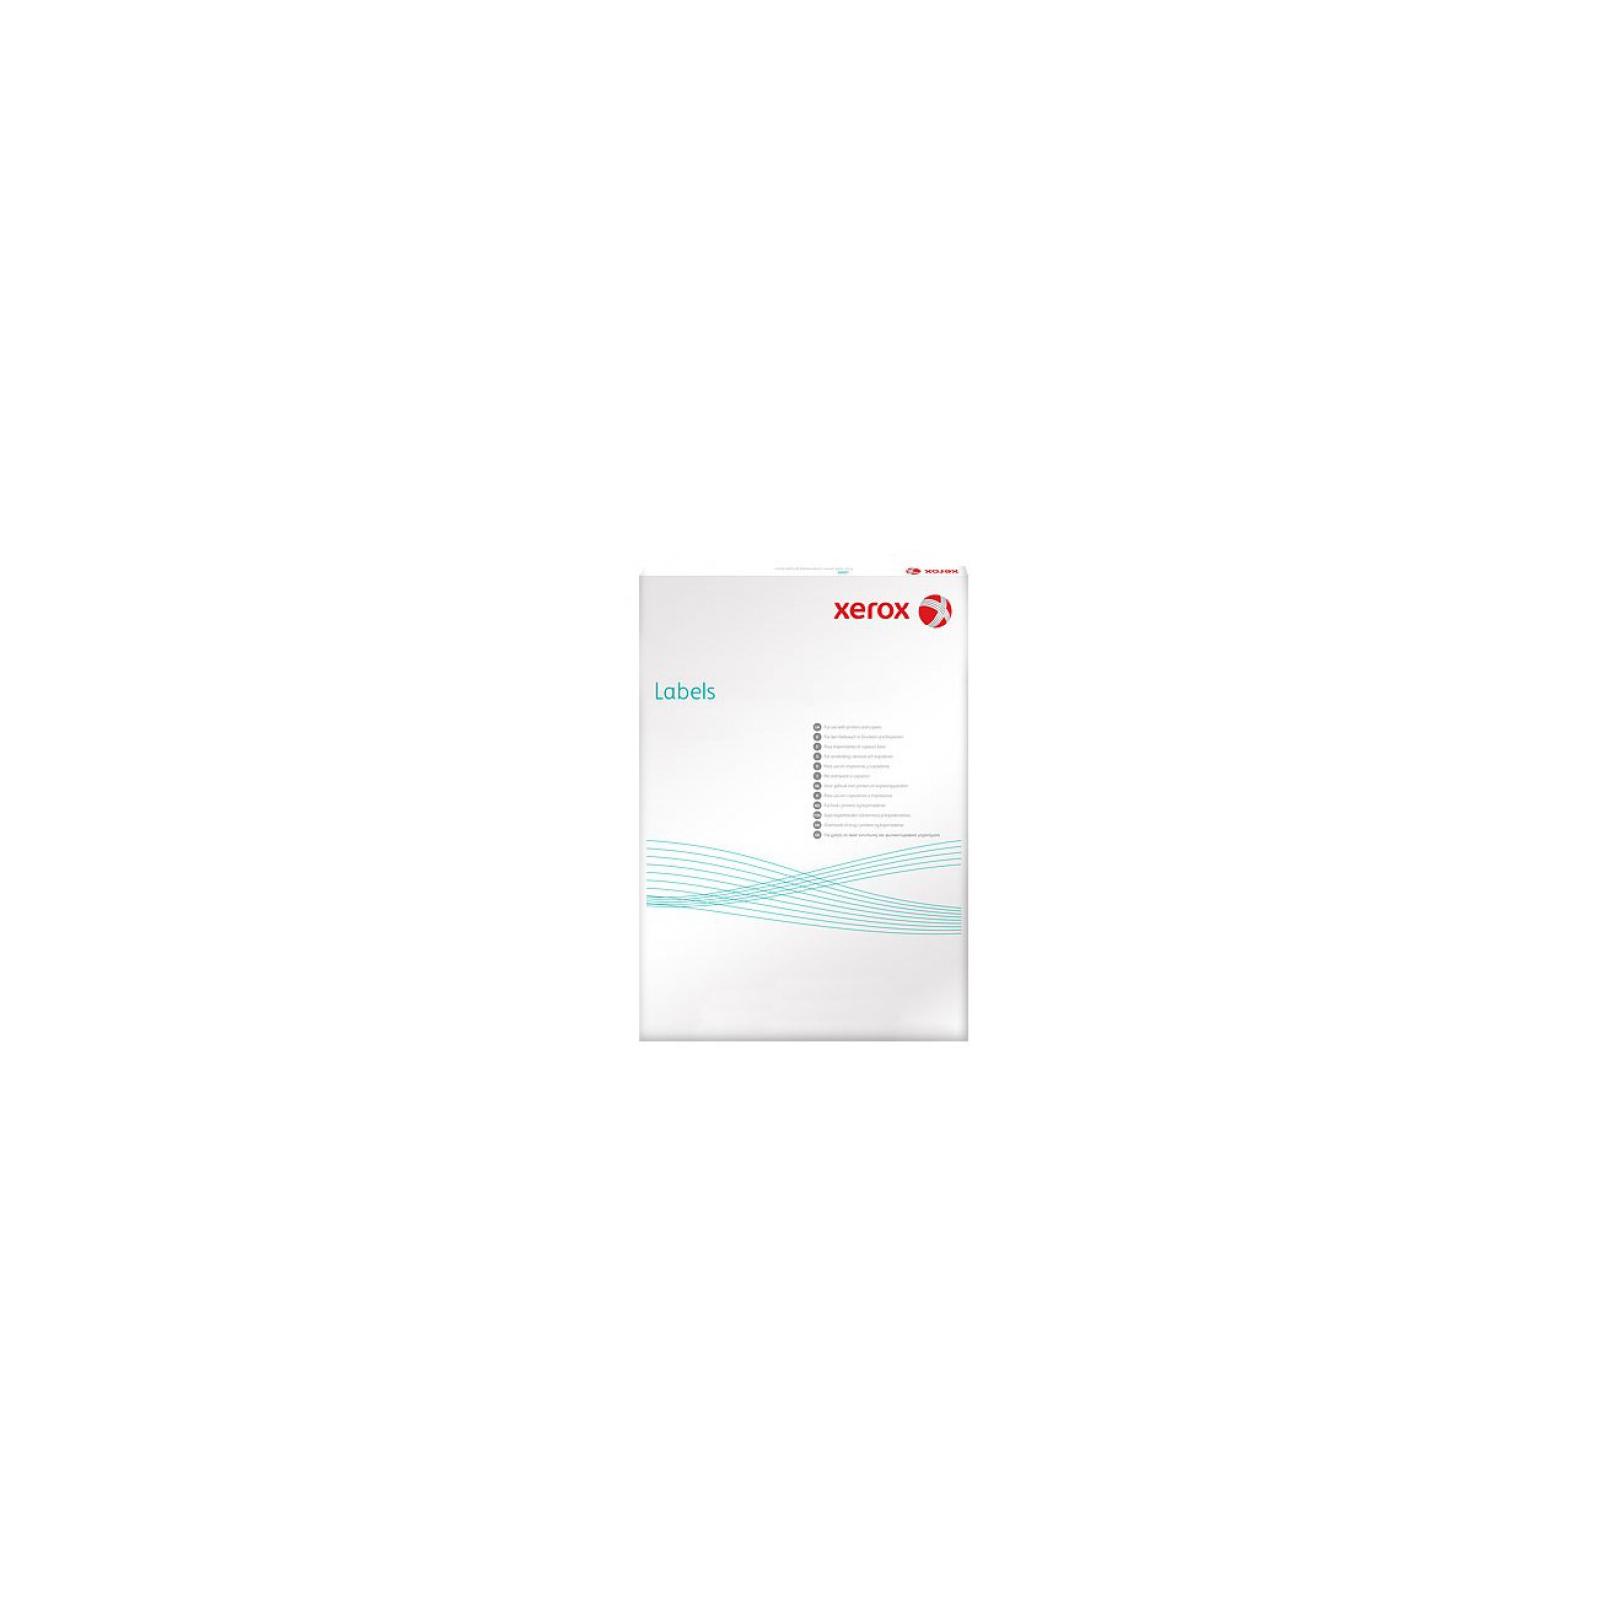 Етикетка самоклеюча Xerox 003R97408